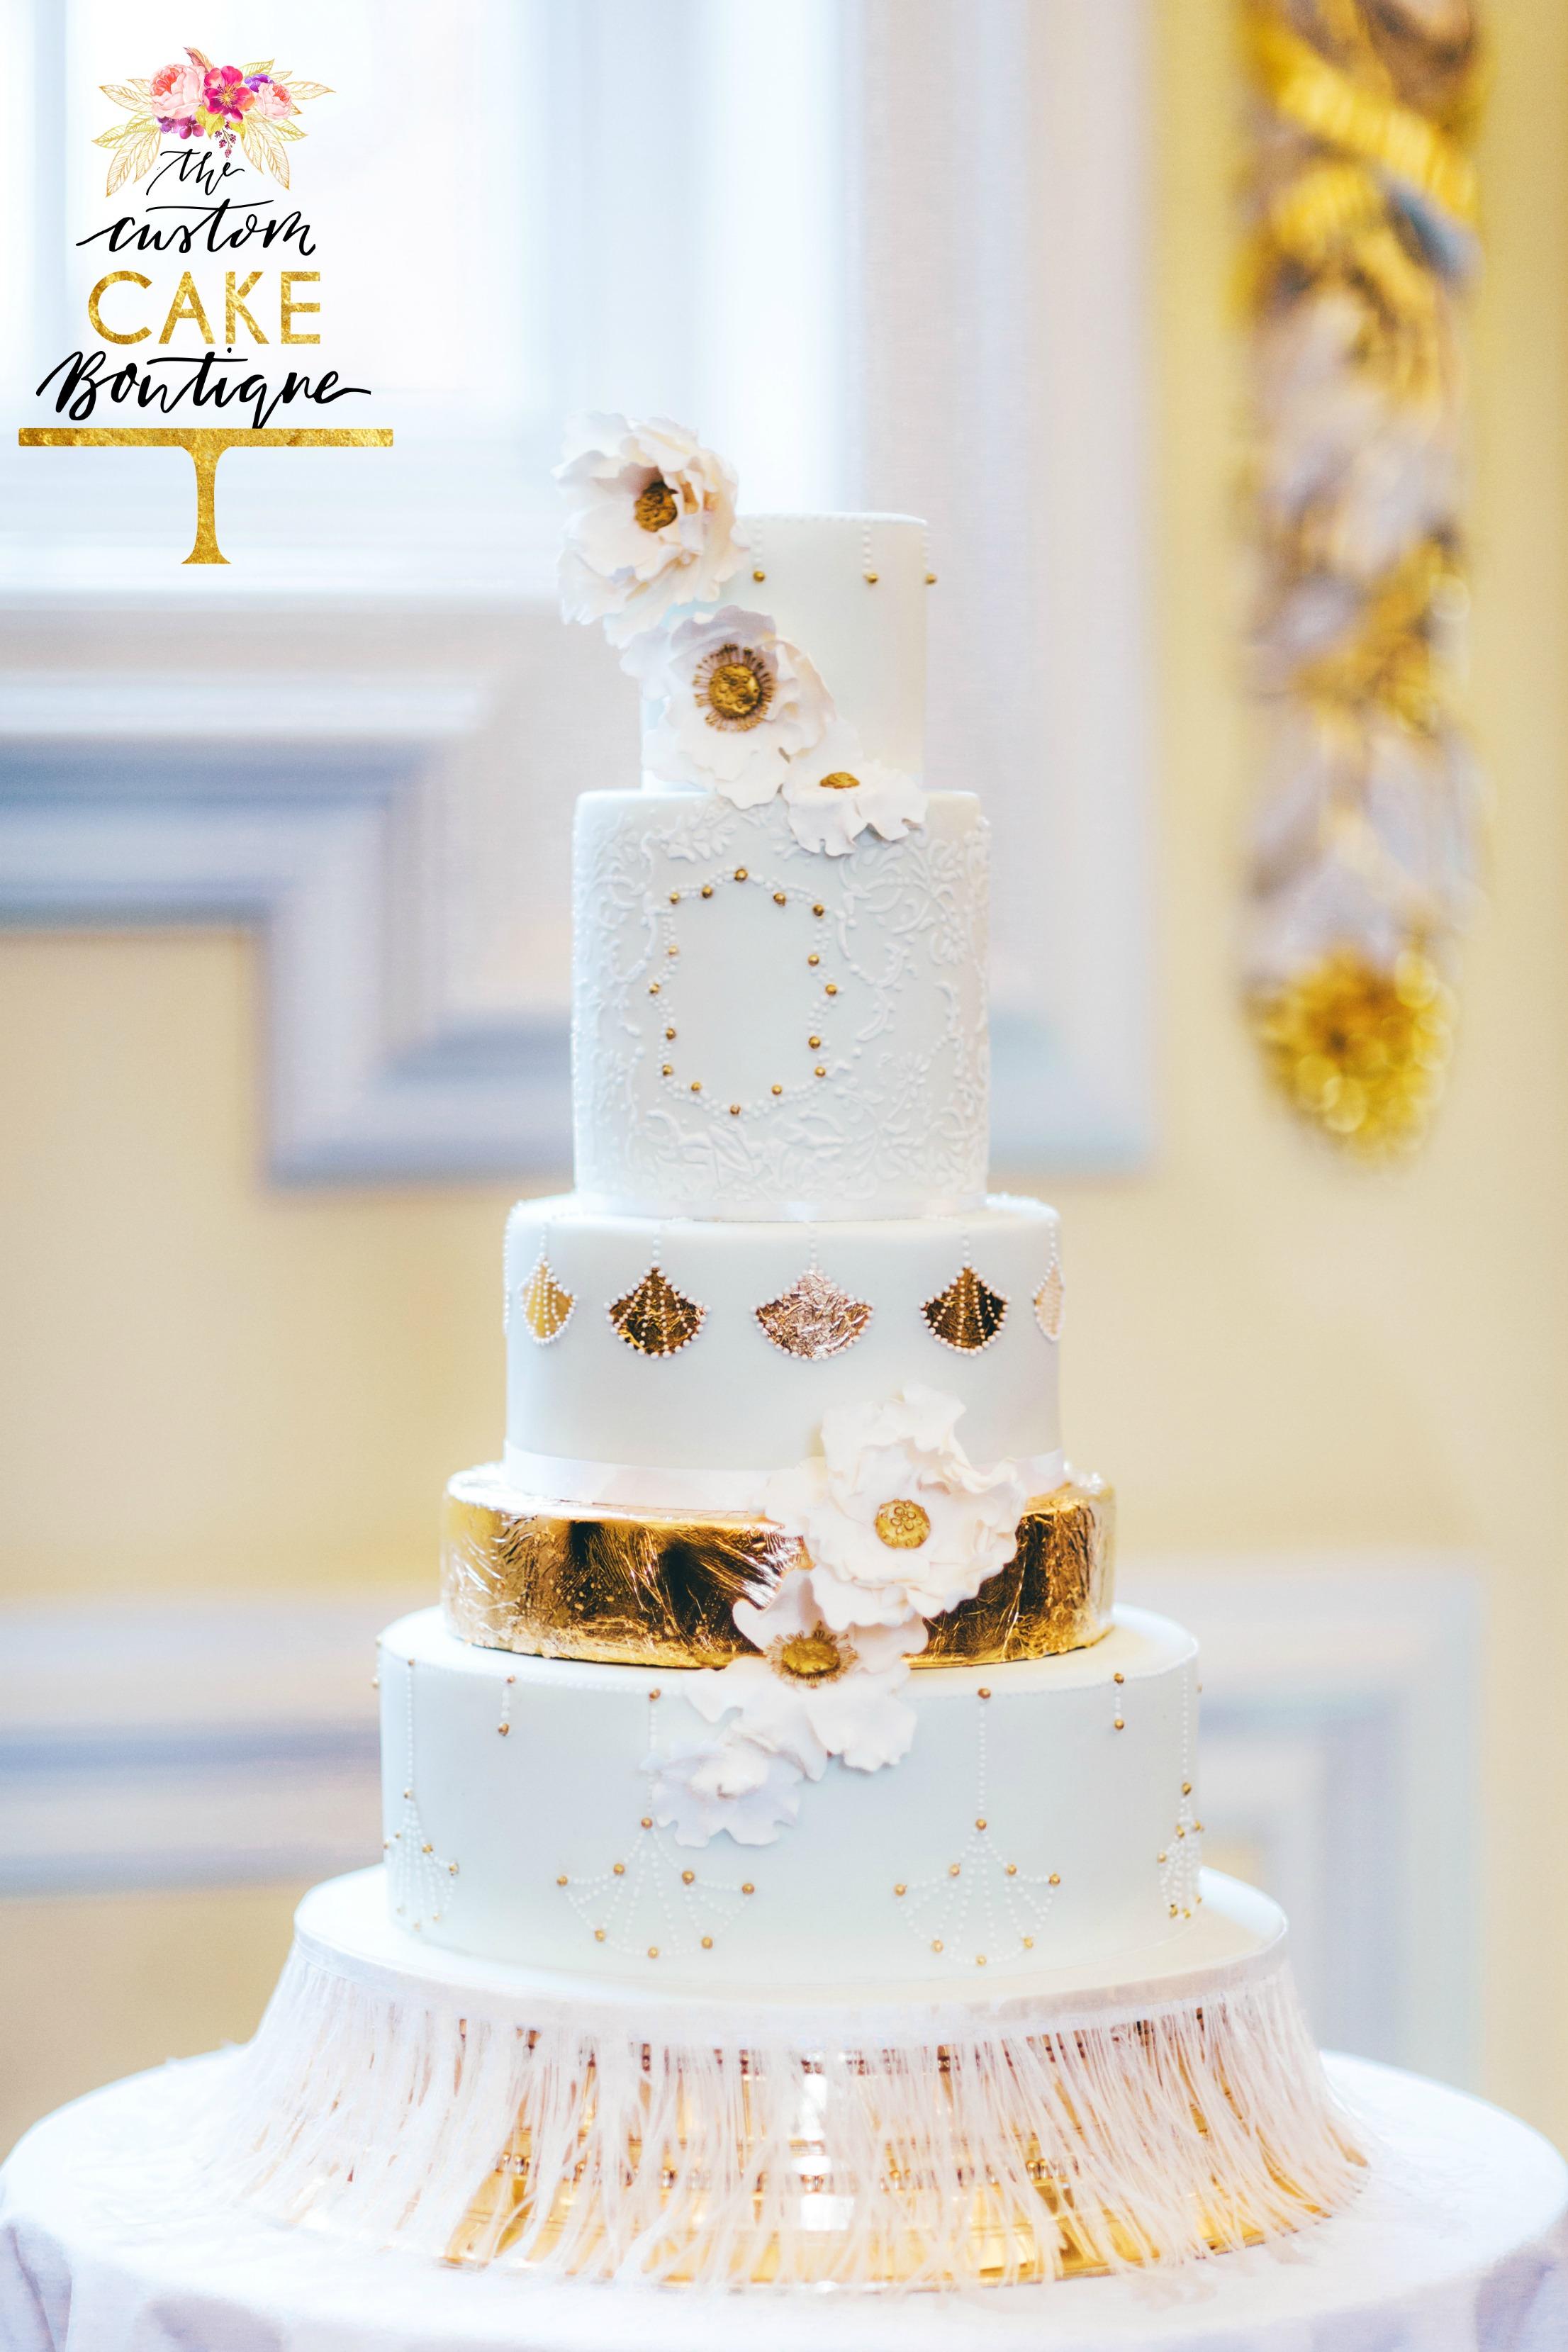 The Custom Cake Boutique | Wedding Cakes London on Feedspot - Rss Feed